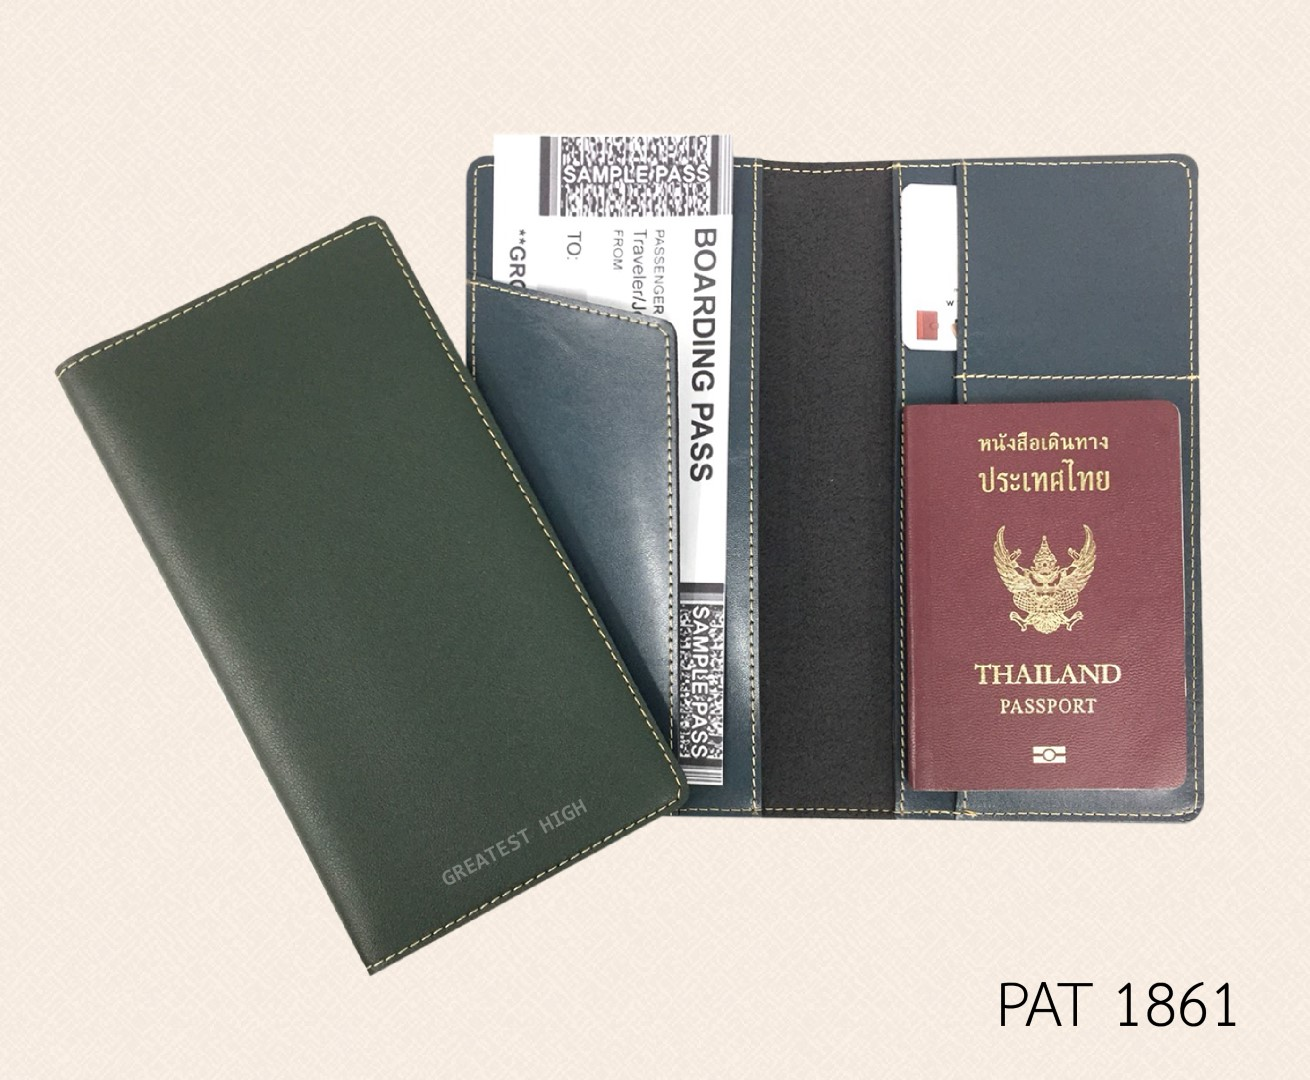 Air ticket and Passport holder : PAT 1861